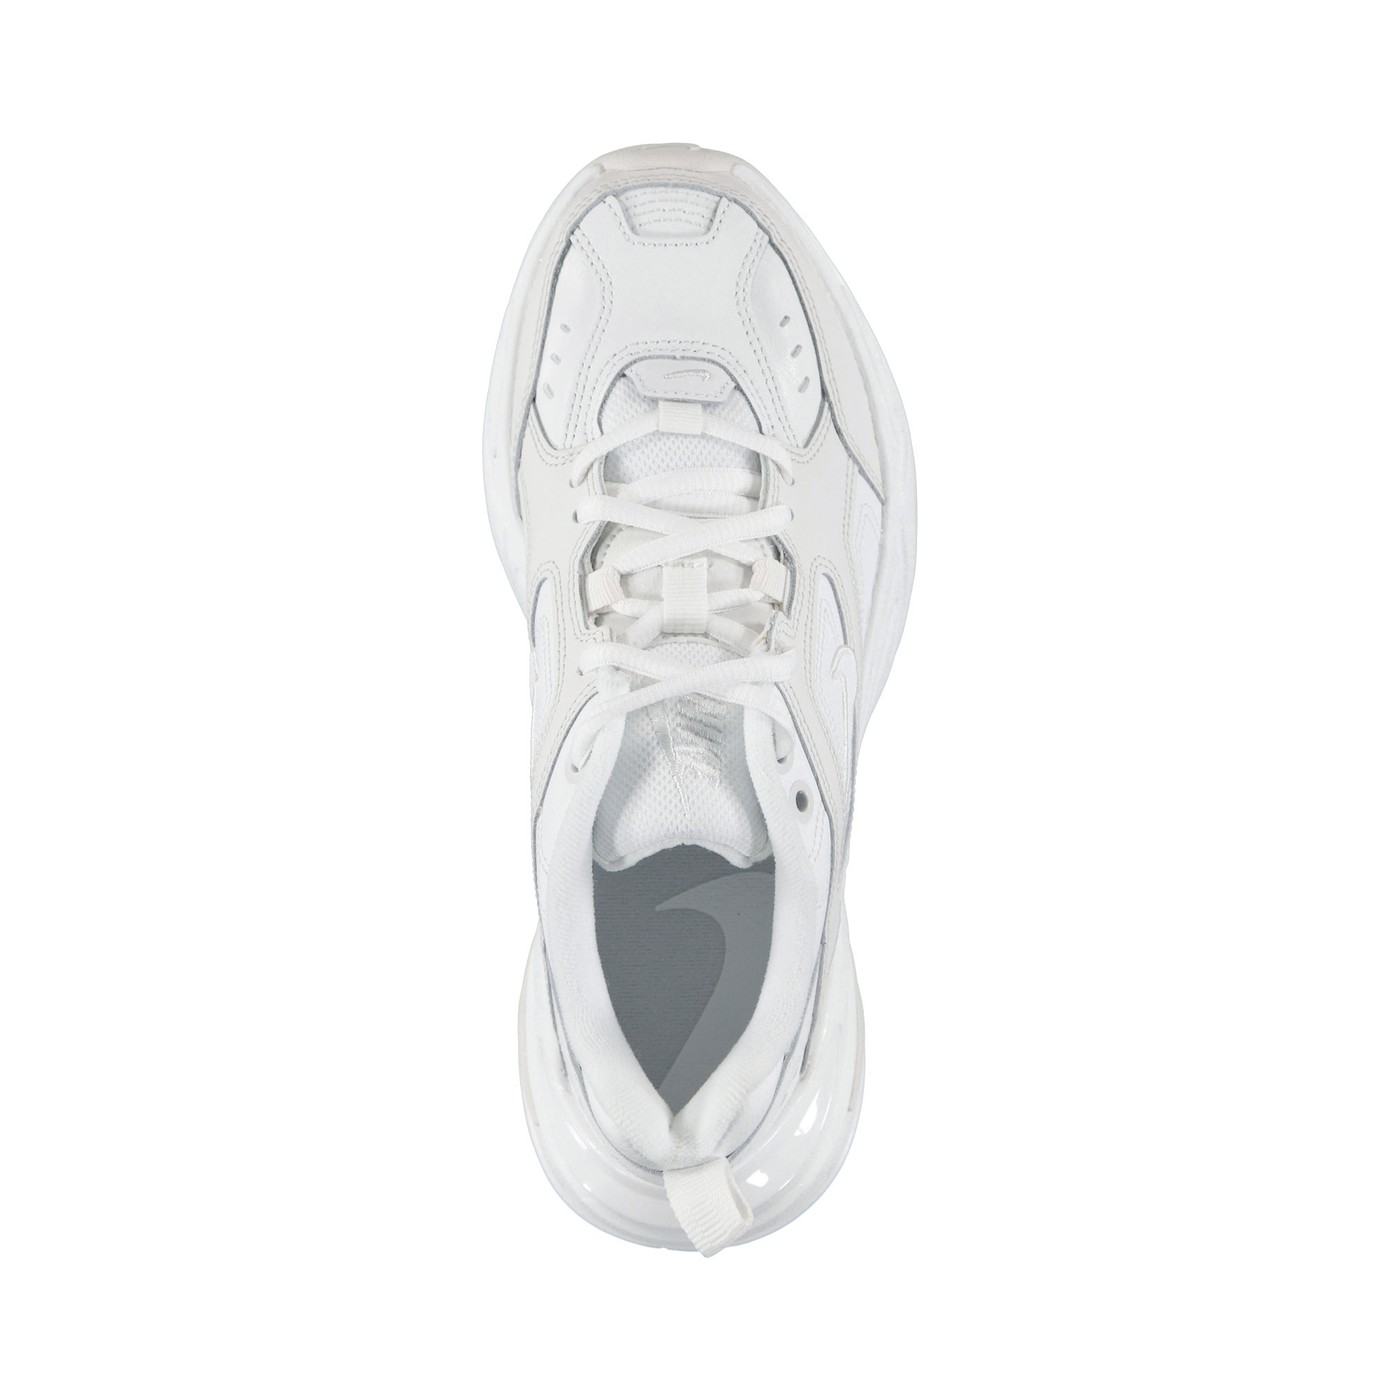 Corrección Escribir Proceso de fabricación de carreteras  Nike M2K Tekno Unisex Beyaz Spor Ayakkabı Kadin Spor Ayakkabı & Sneaker  3260532 | SuperStep